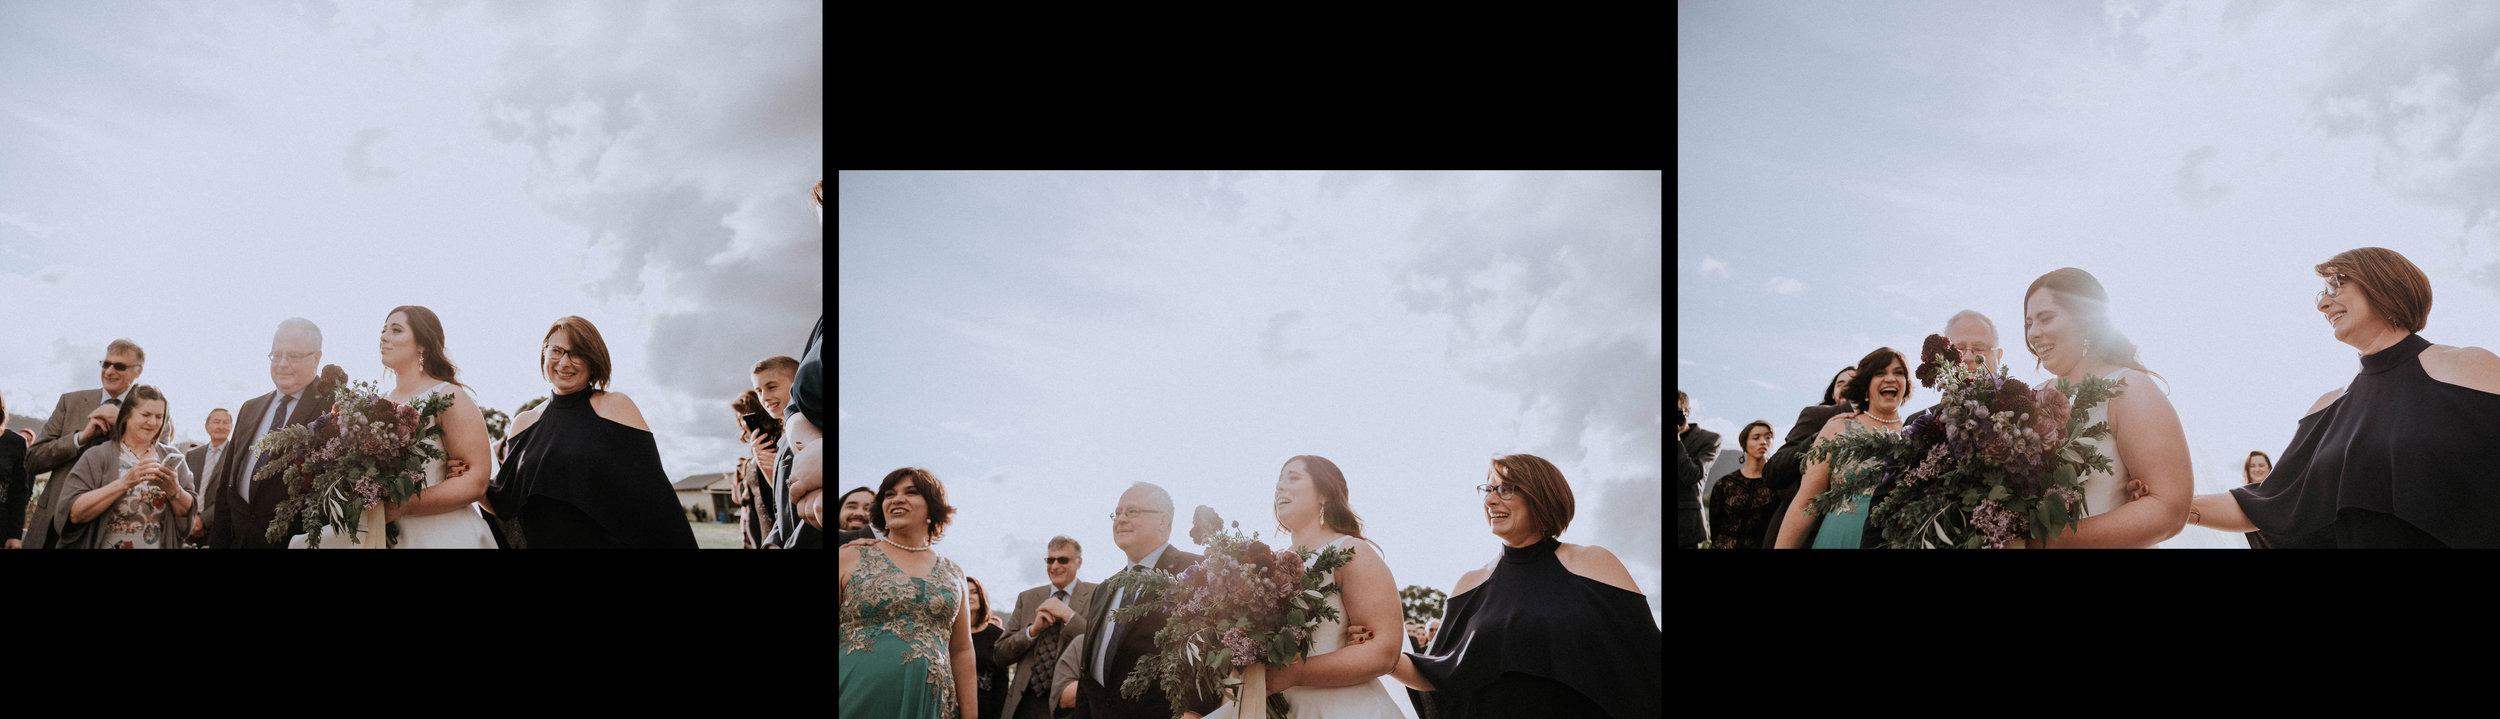 hunter valley wedding - stitch 4.jpg